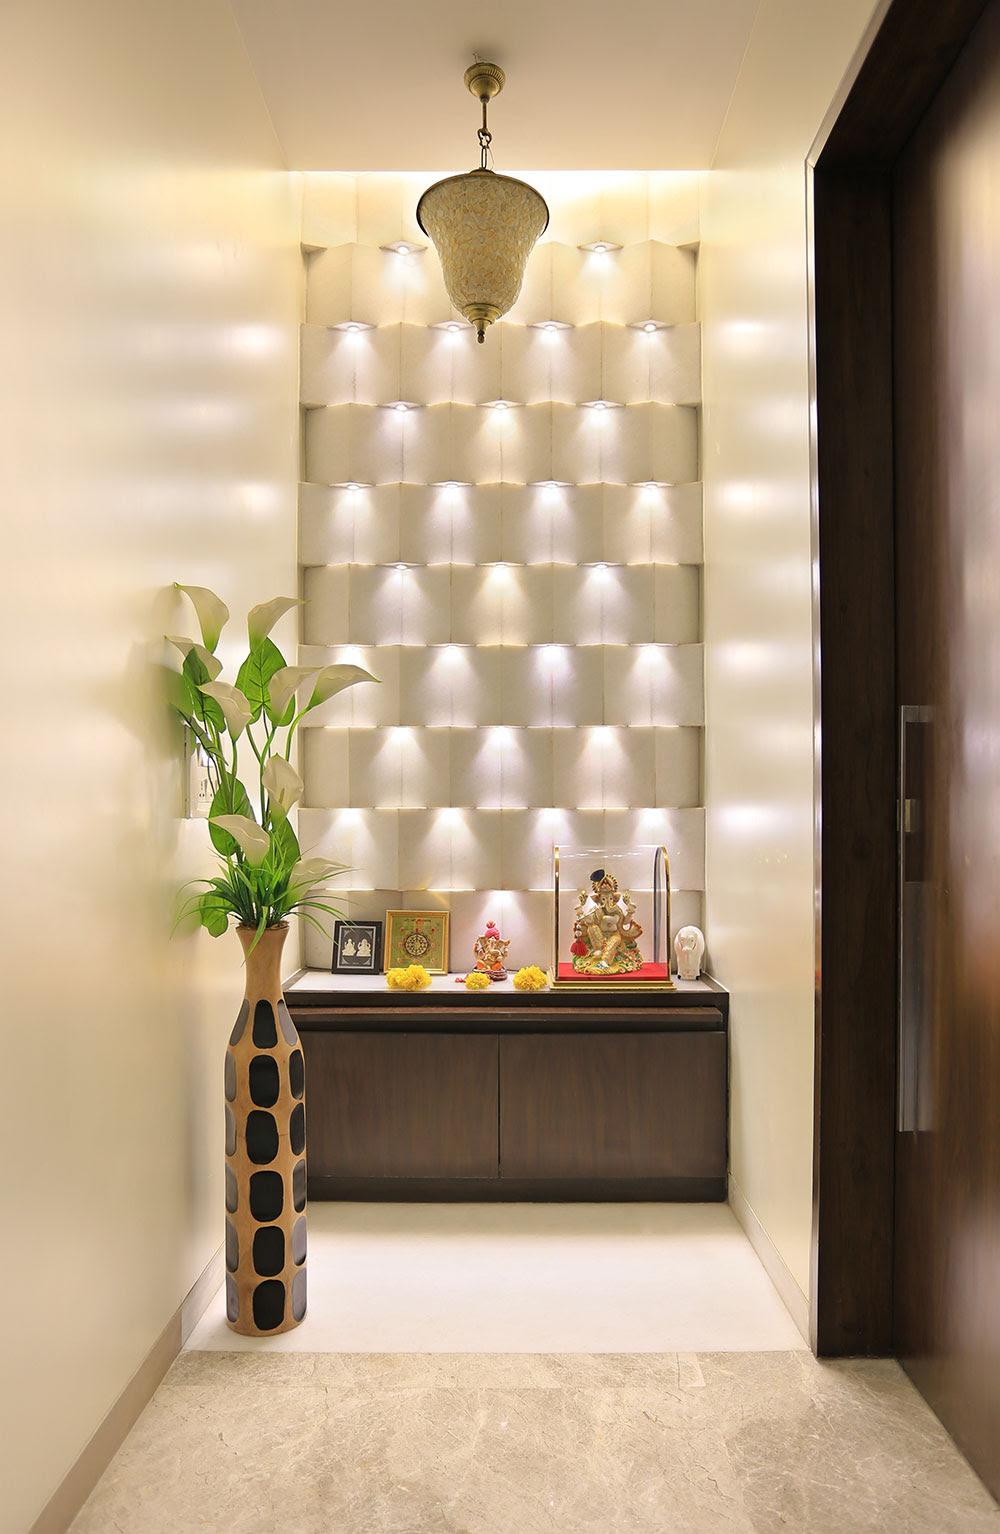 Pooja Space in the Corridor